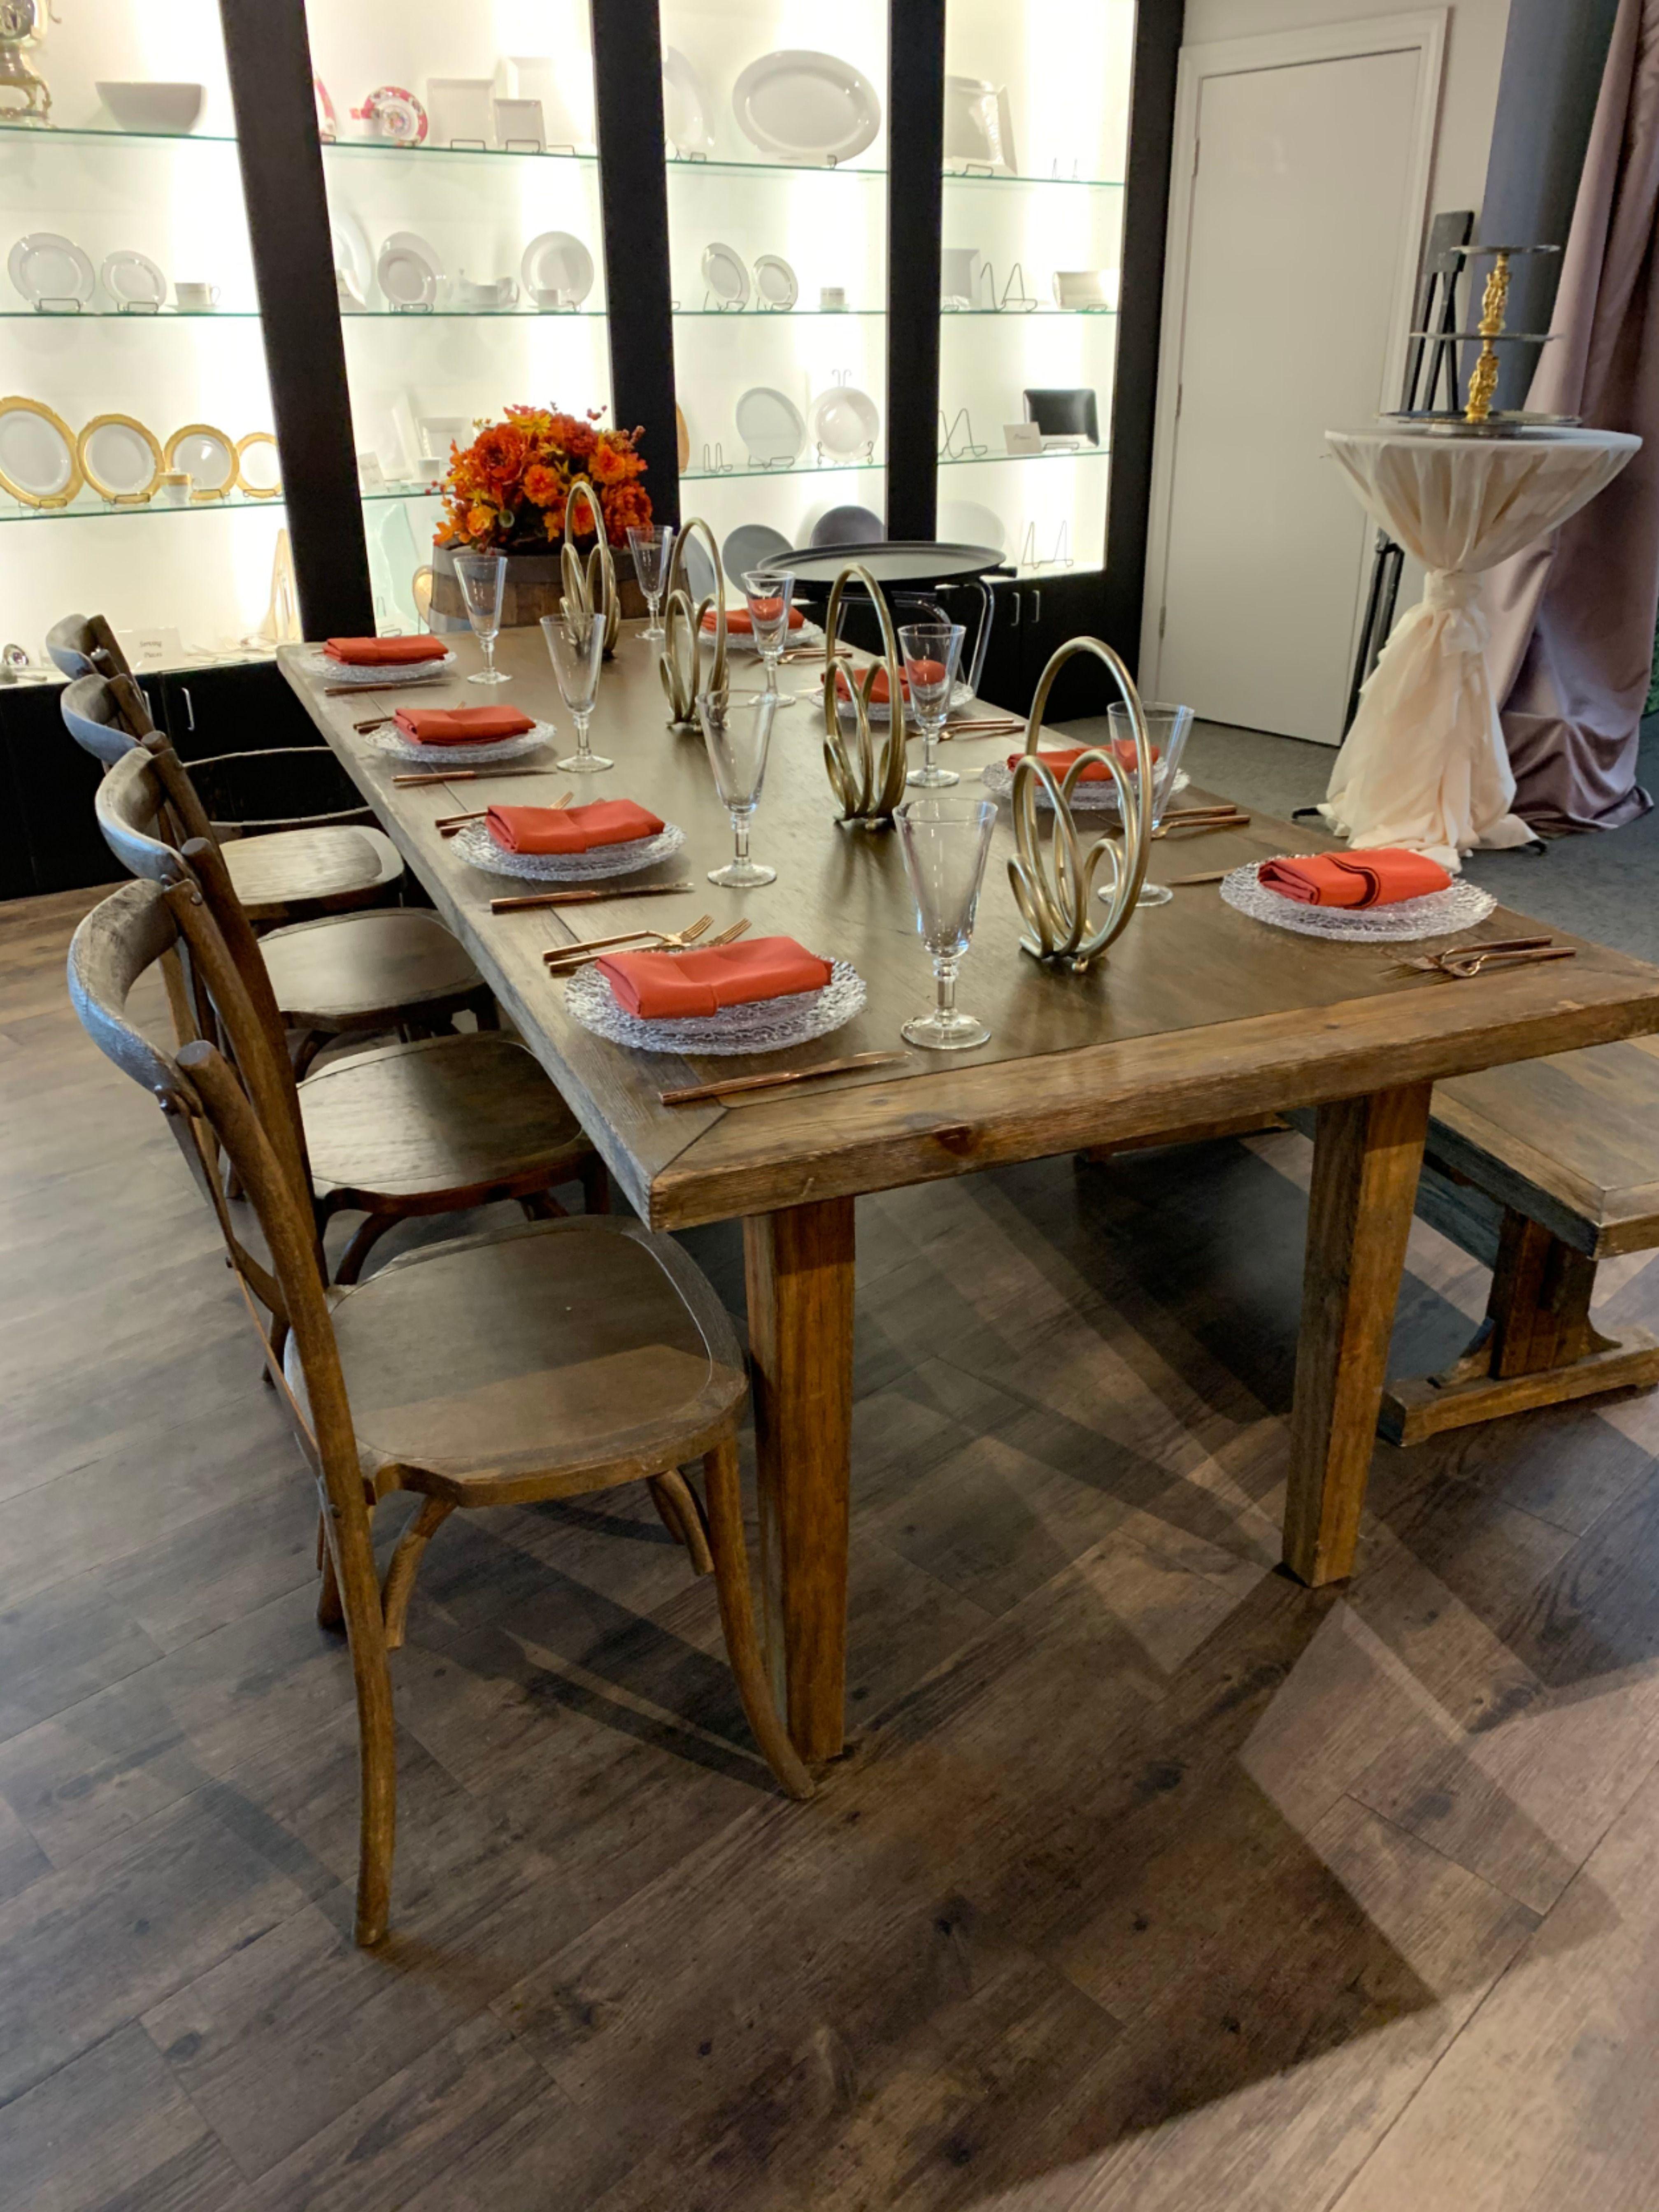 Beautiful Table Arrangement in WISEACRE Preferred Vendor